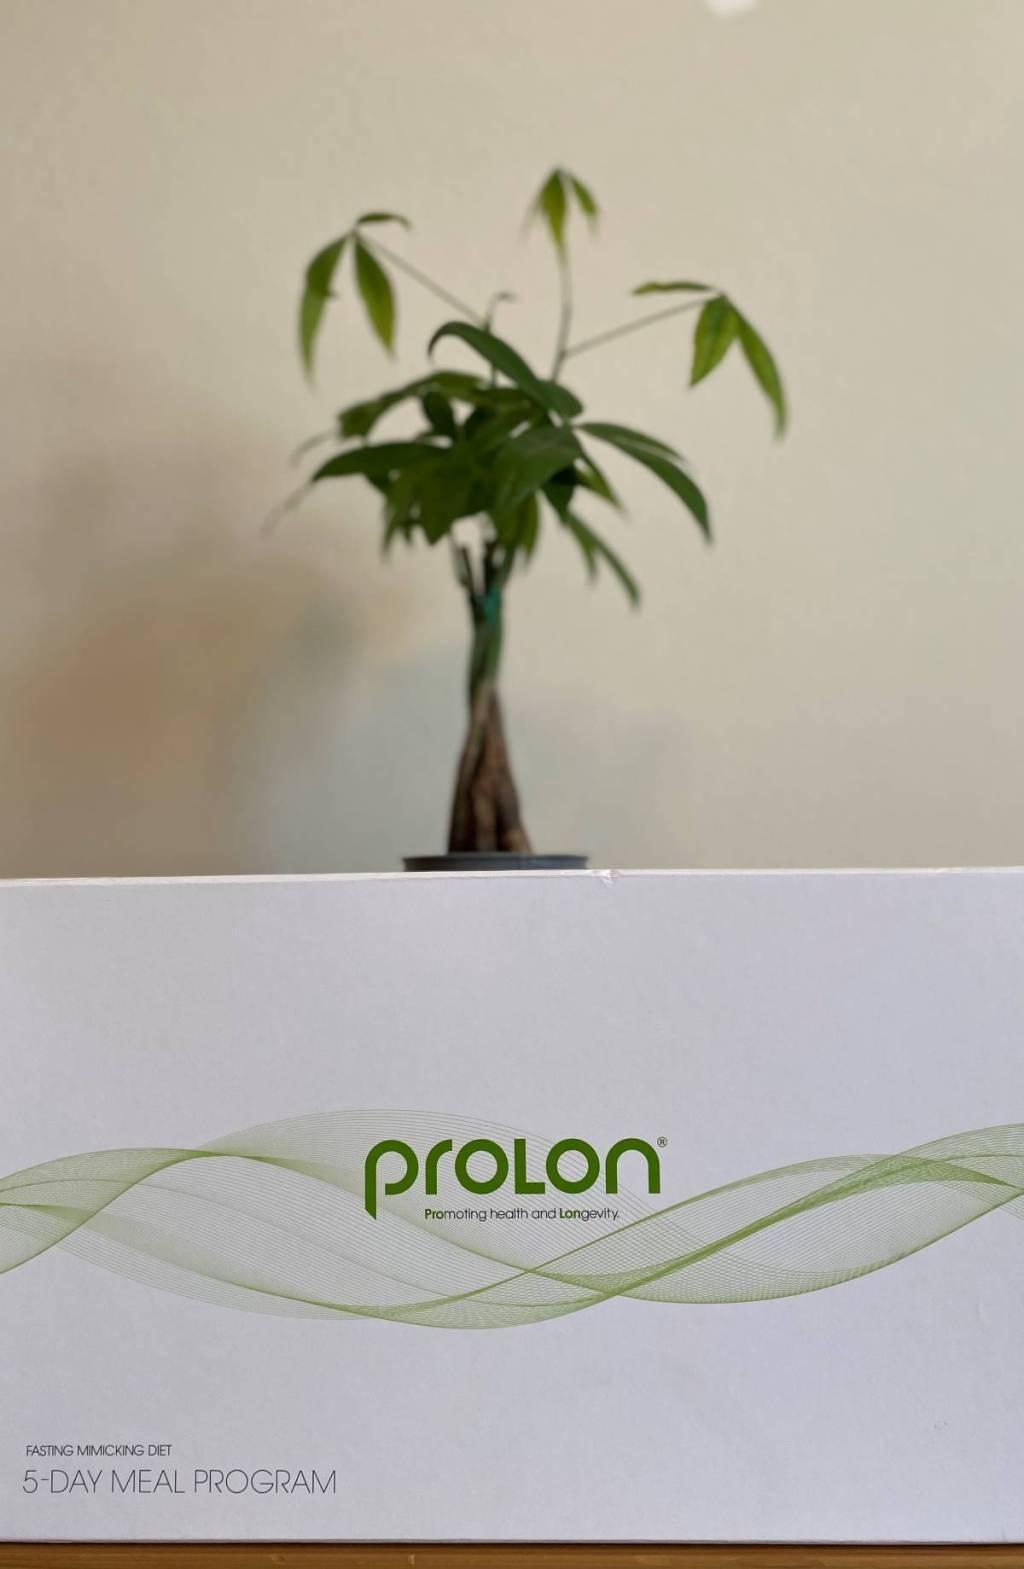 Prolon Kit and plant